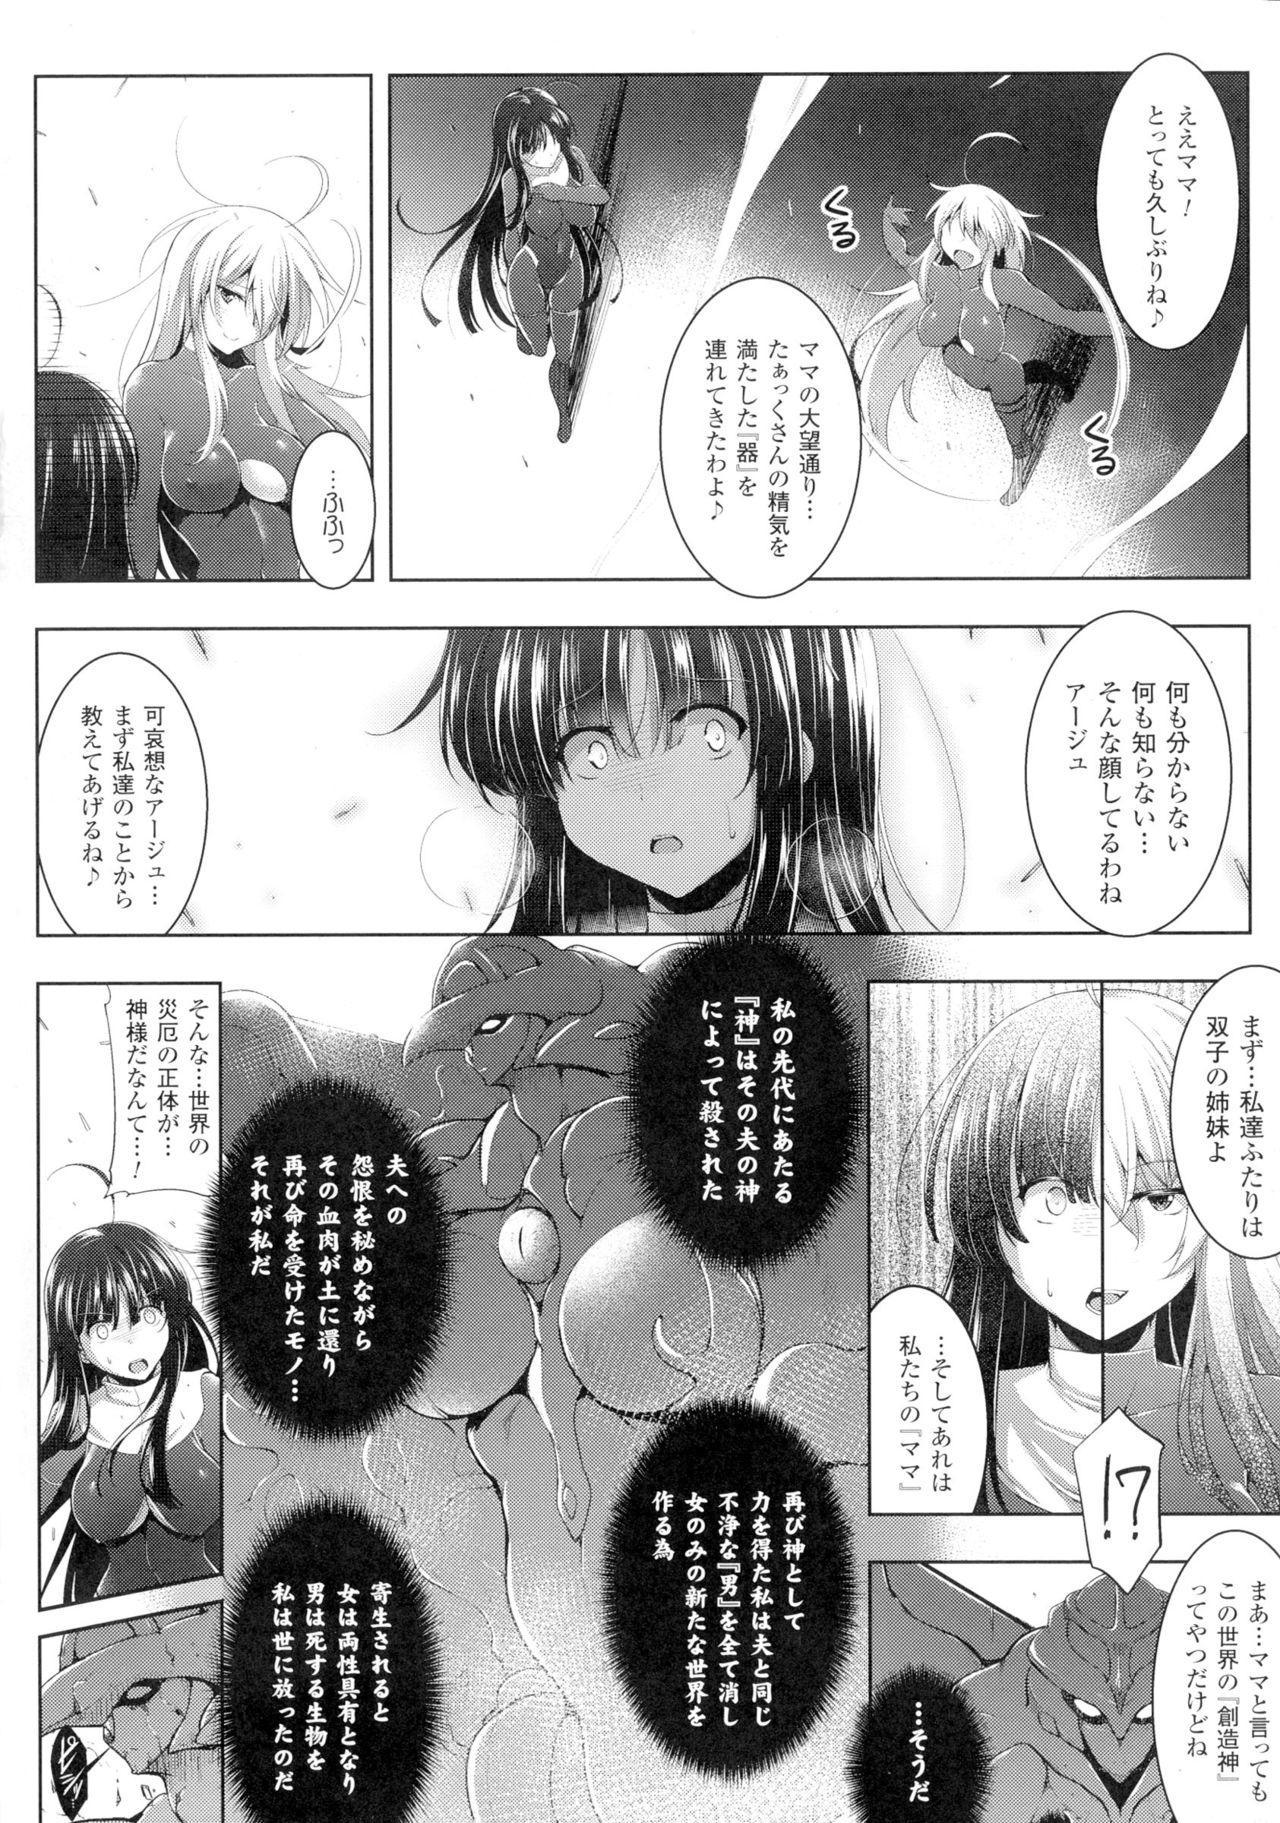 Seigi no Heroine Kangoku File DX Vol. 1 95